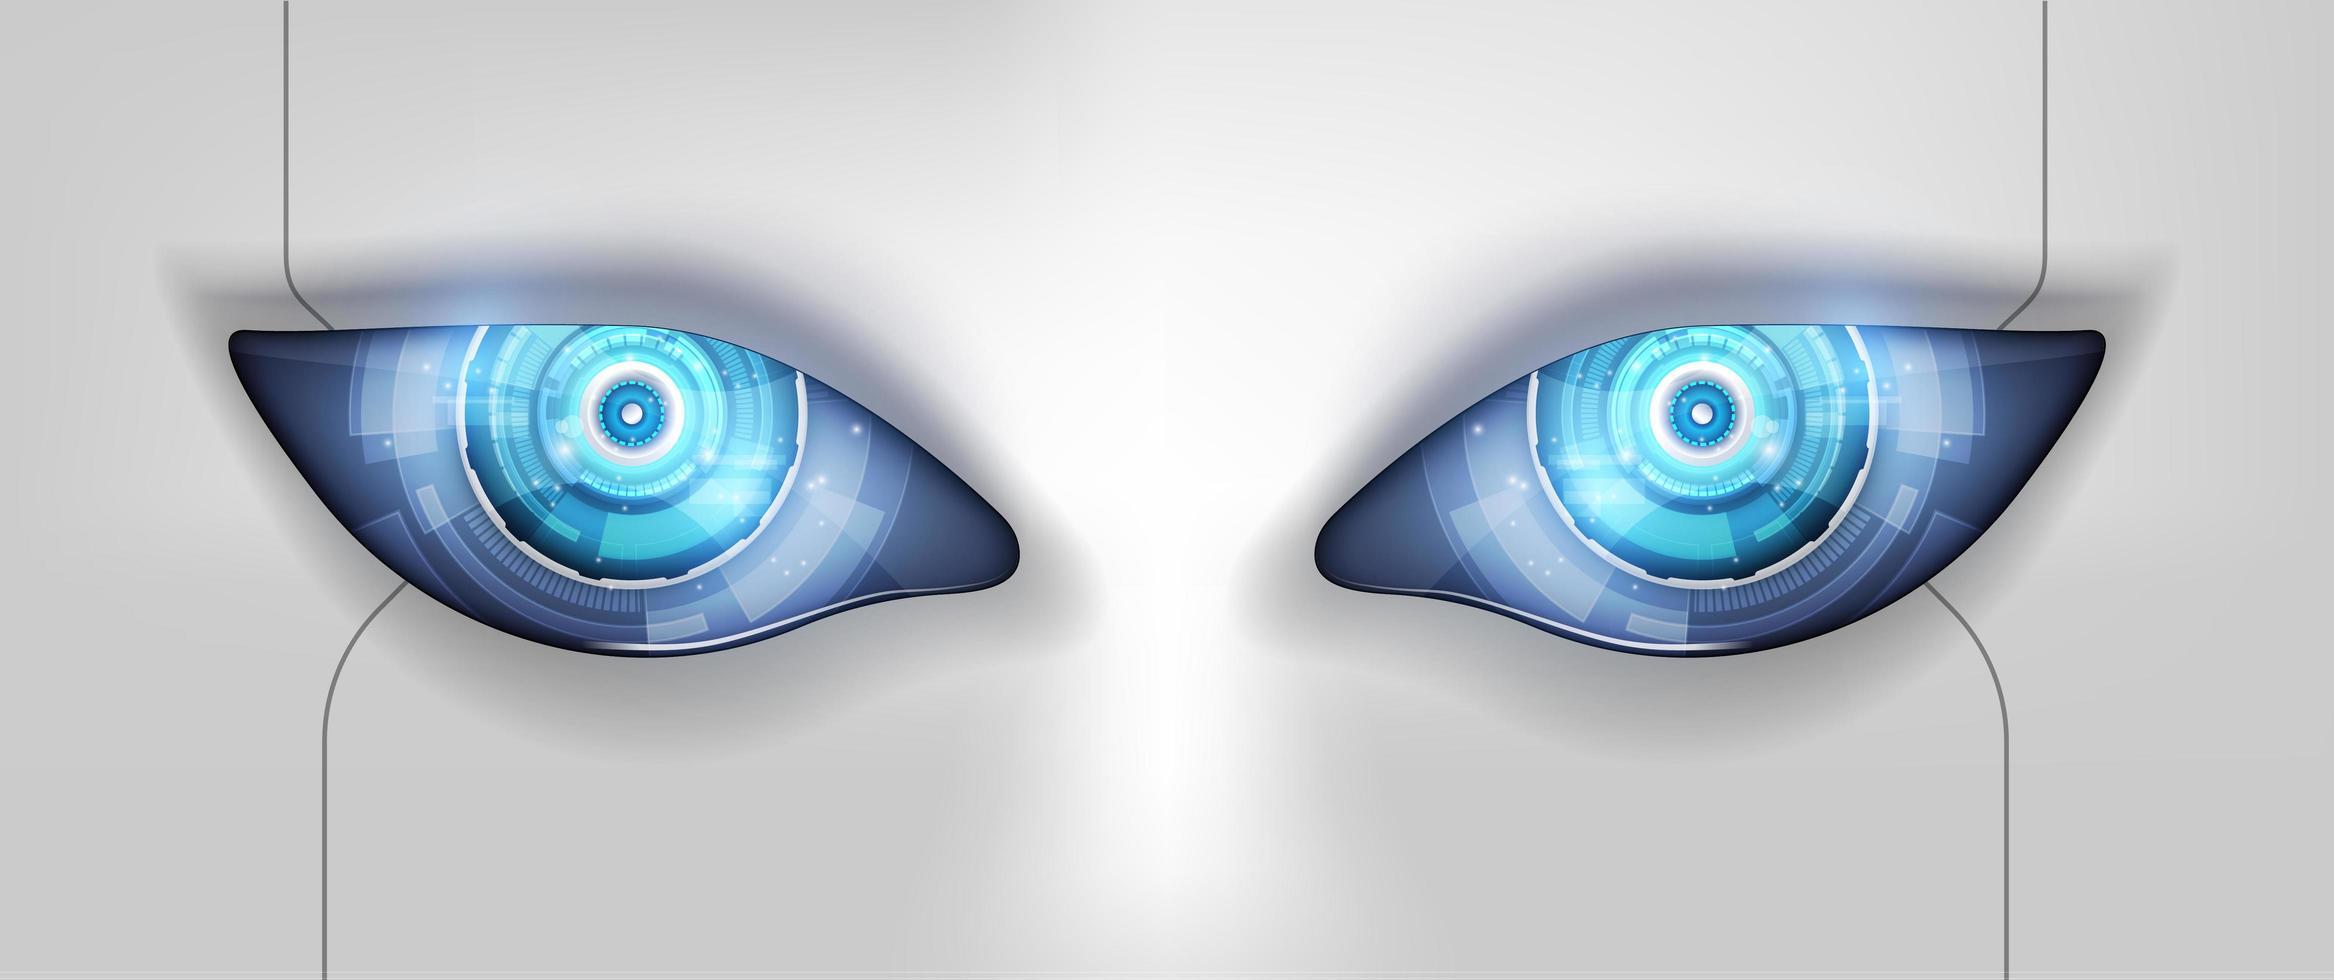 Auge des Roboters. futuristische Hud-Schnittstelle, Vektorillustration vektor